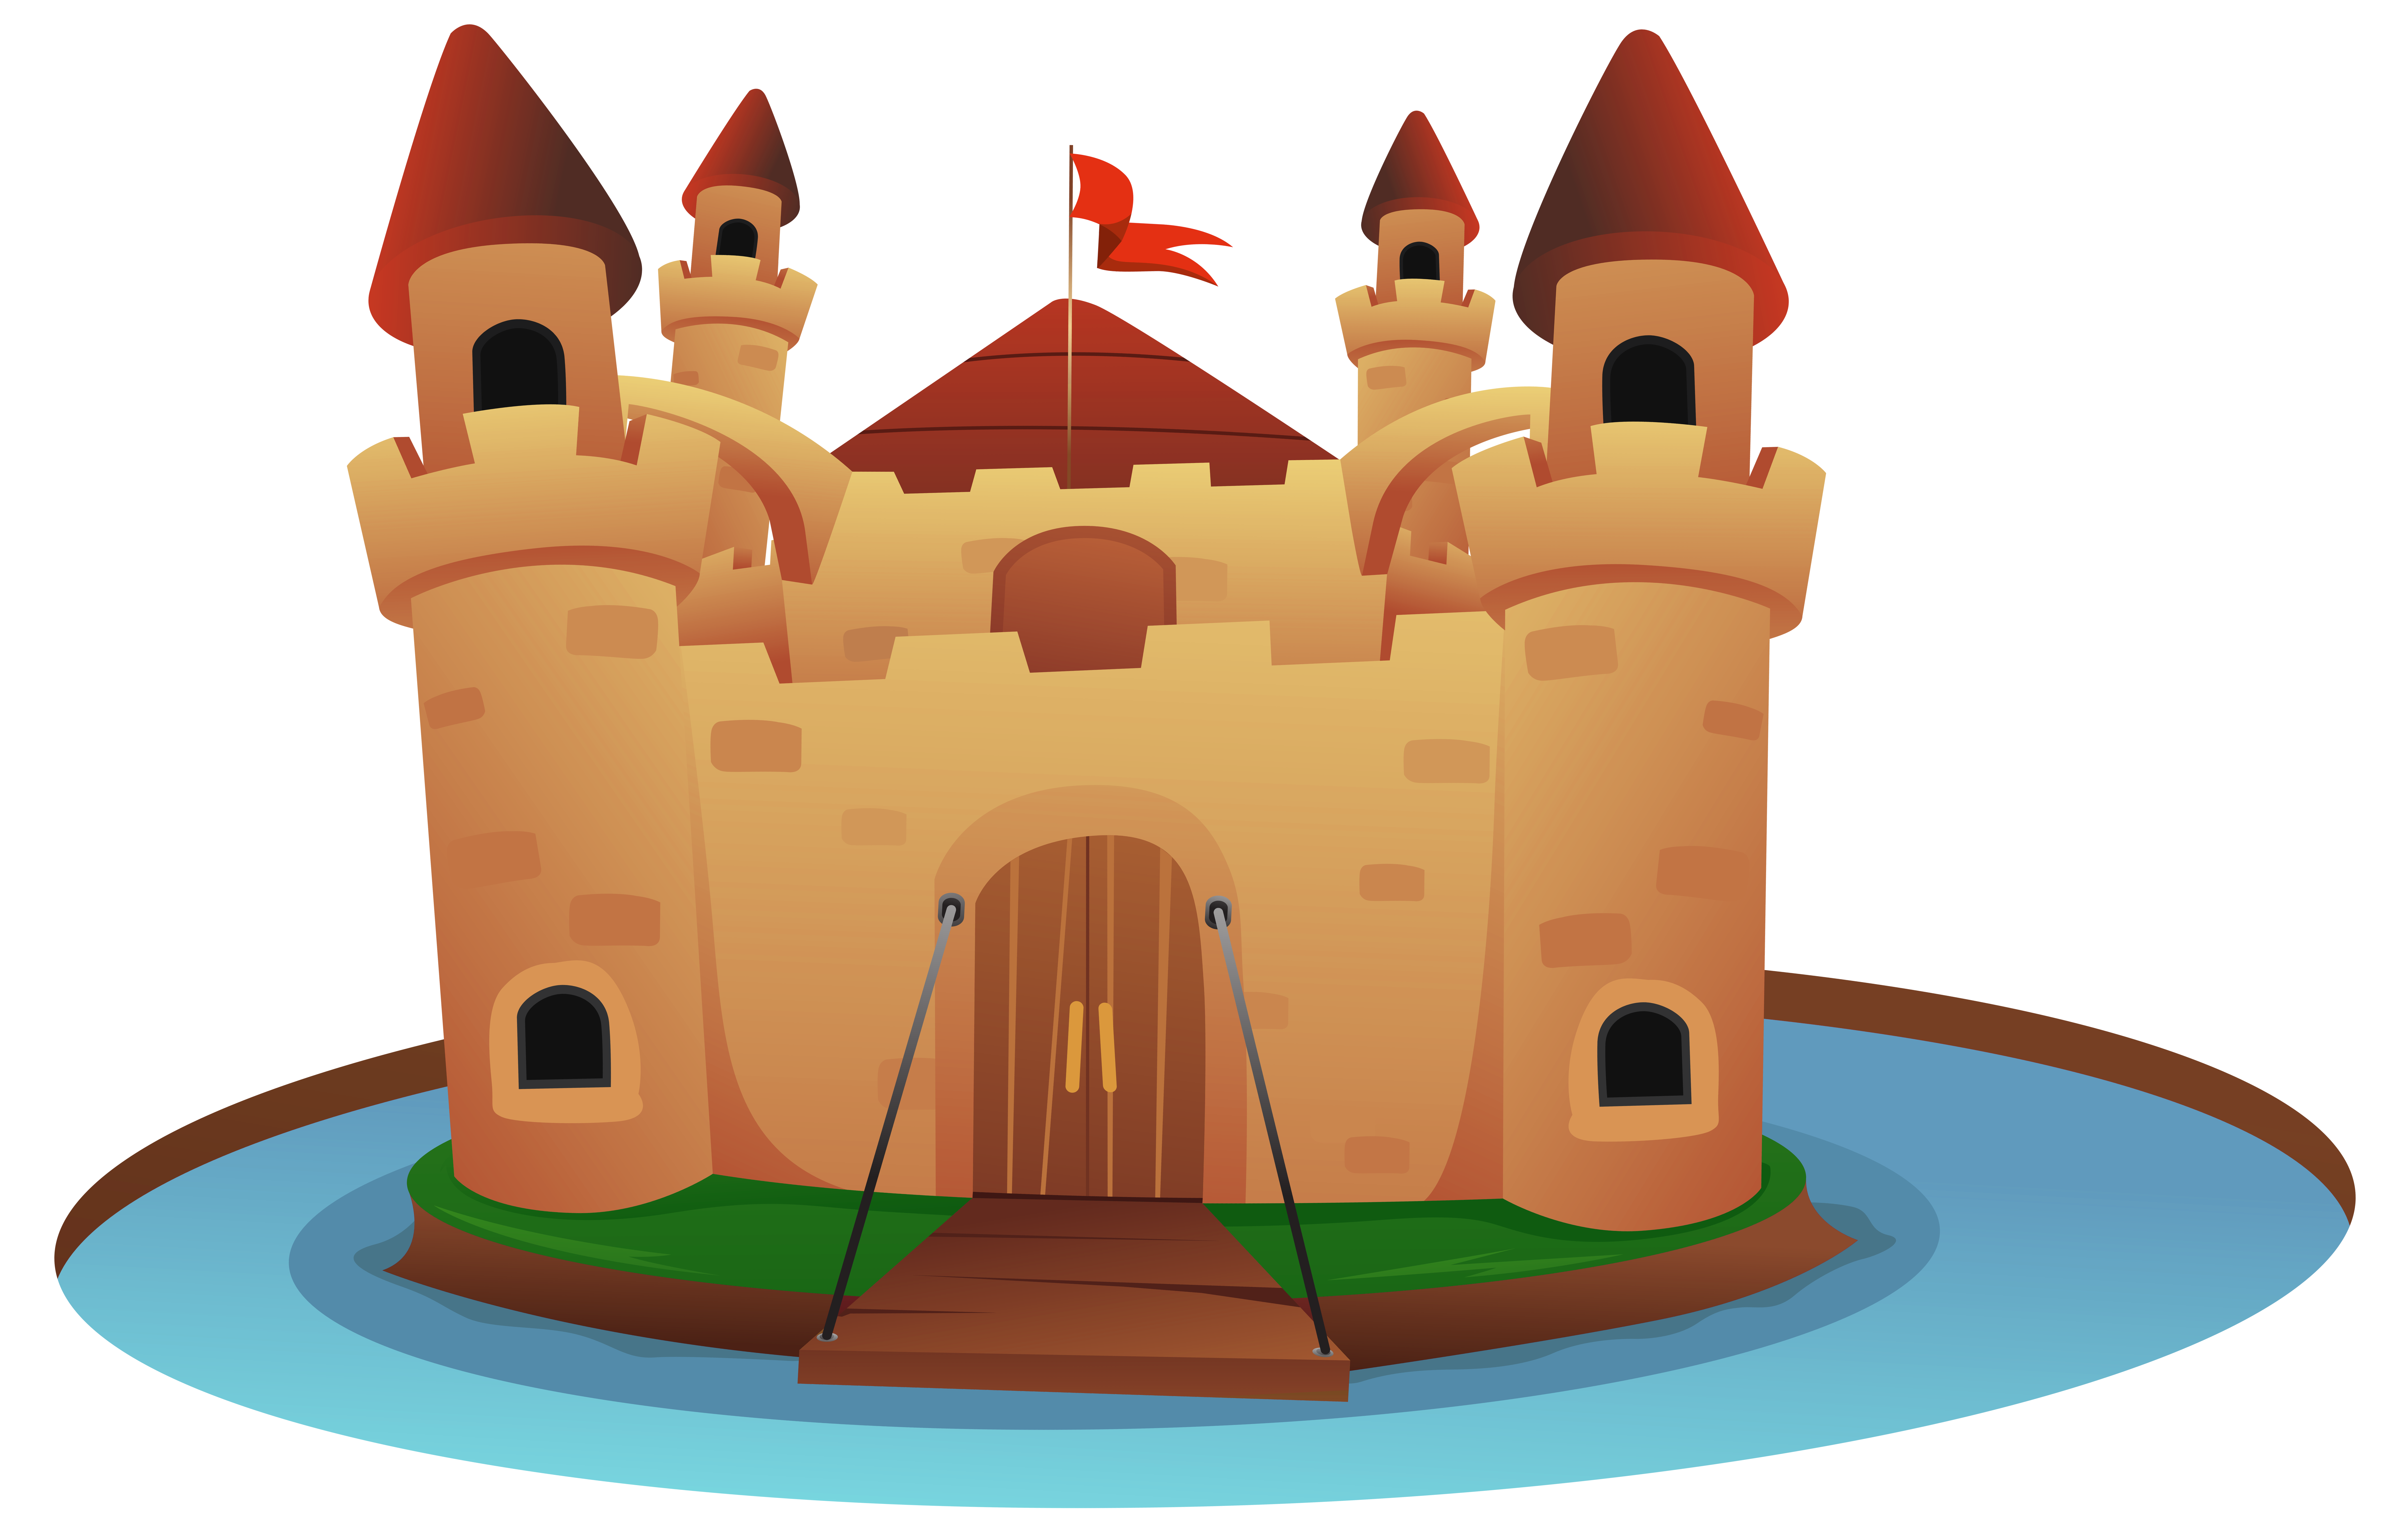 Castle cartoon clipart clip art royalty free download Castle Cartoon PNG Clip Art Image   Gallery Yopriceville - High ... clip art royalty free download